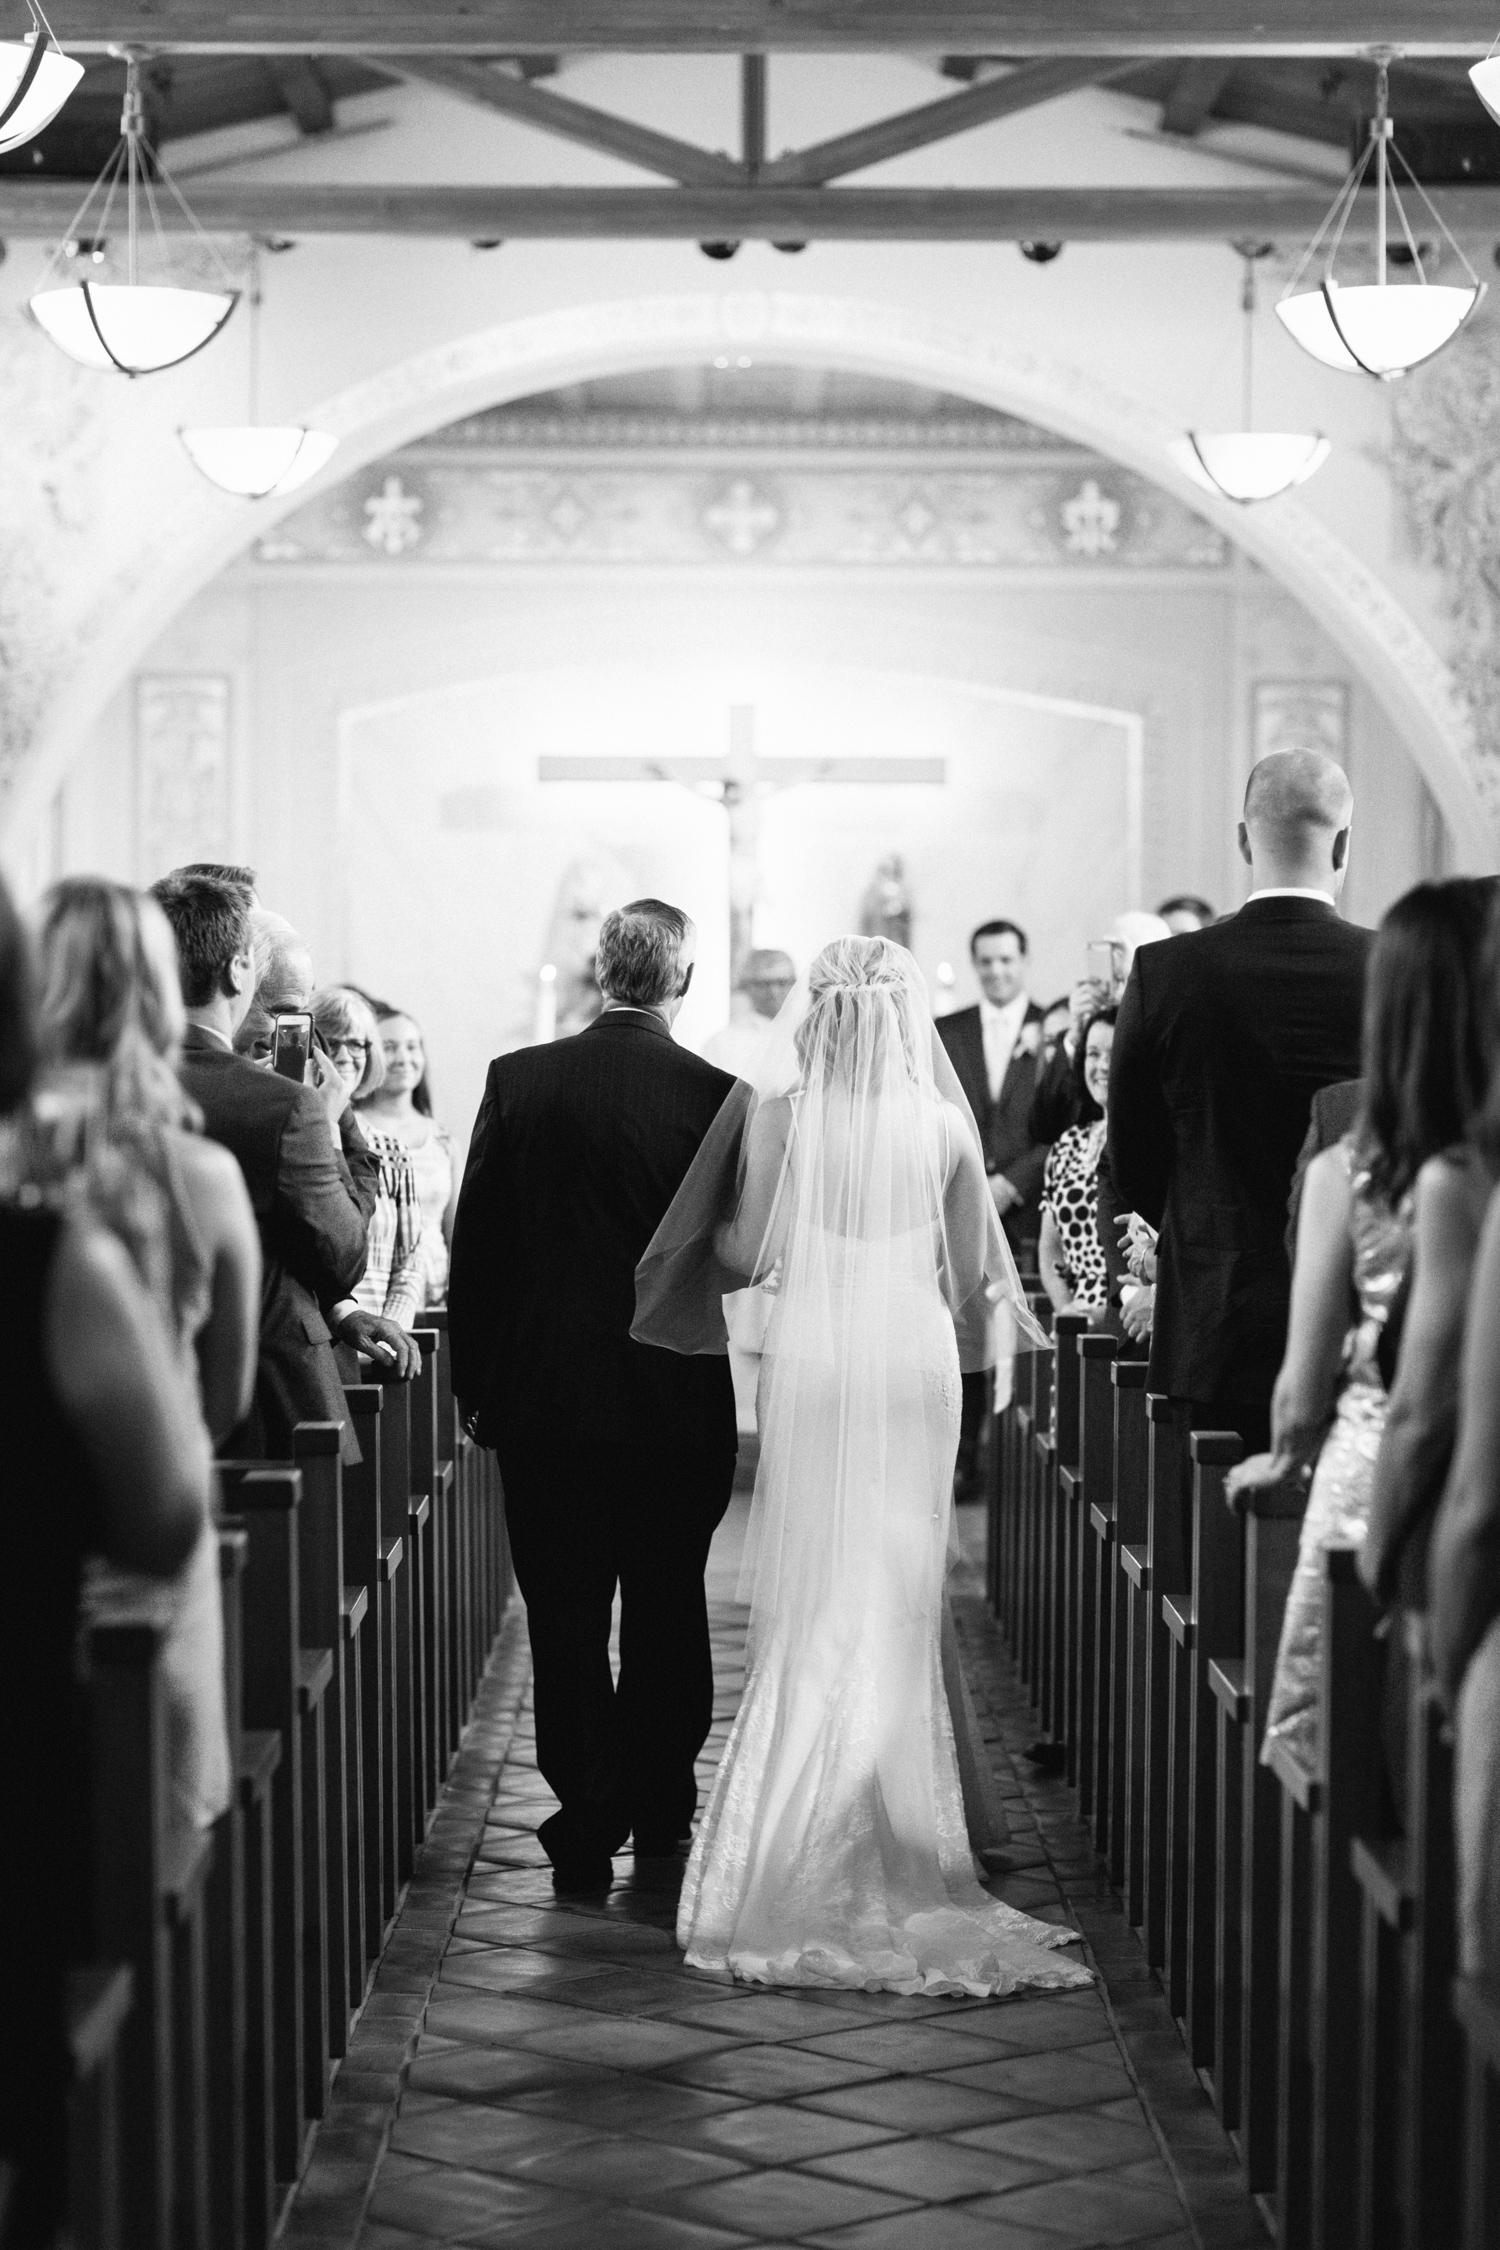 084-Jen-Wojcik-Photography-San-Diego-Wedding-Photographer.jpg